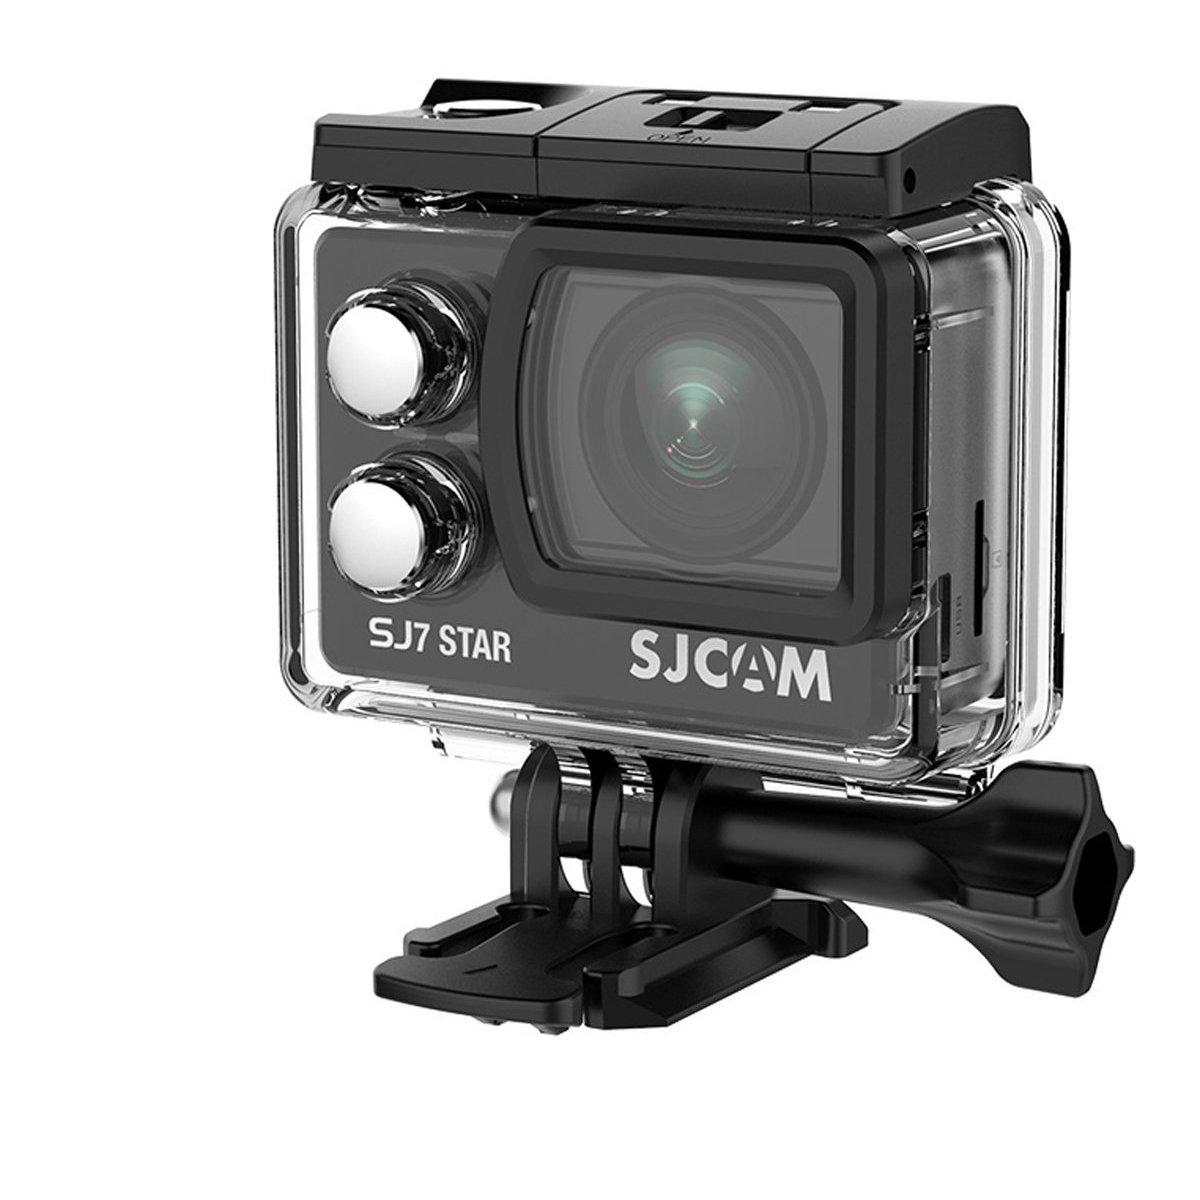 SJCAM SJ7 STAR(2017年改良版) 4Kアルミニウムボディスポーツカメラ(追加電池*1、microsd 16GB*1同梱)タッチスクリーン ジャイロスコープ アクションカメラ  ブラック B01M8O7GO8